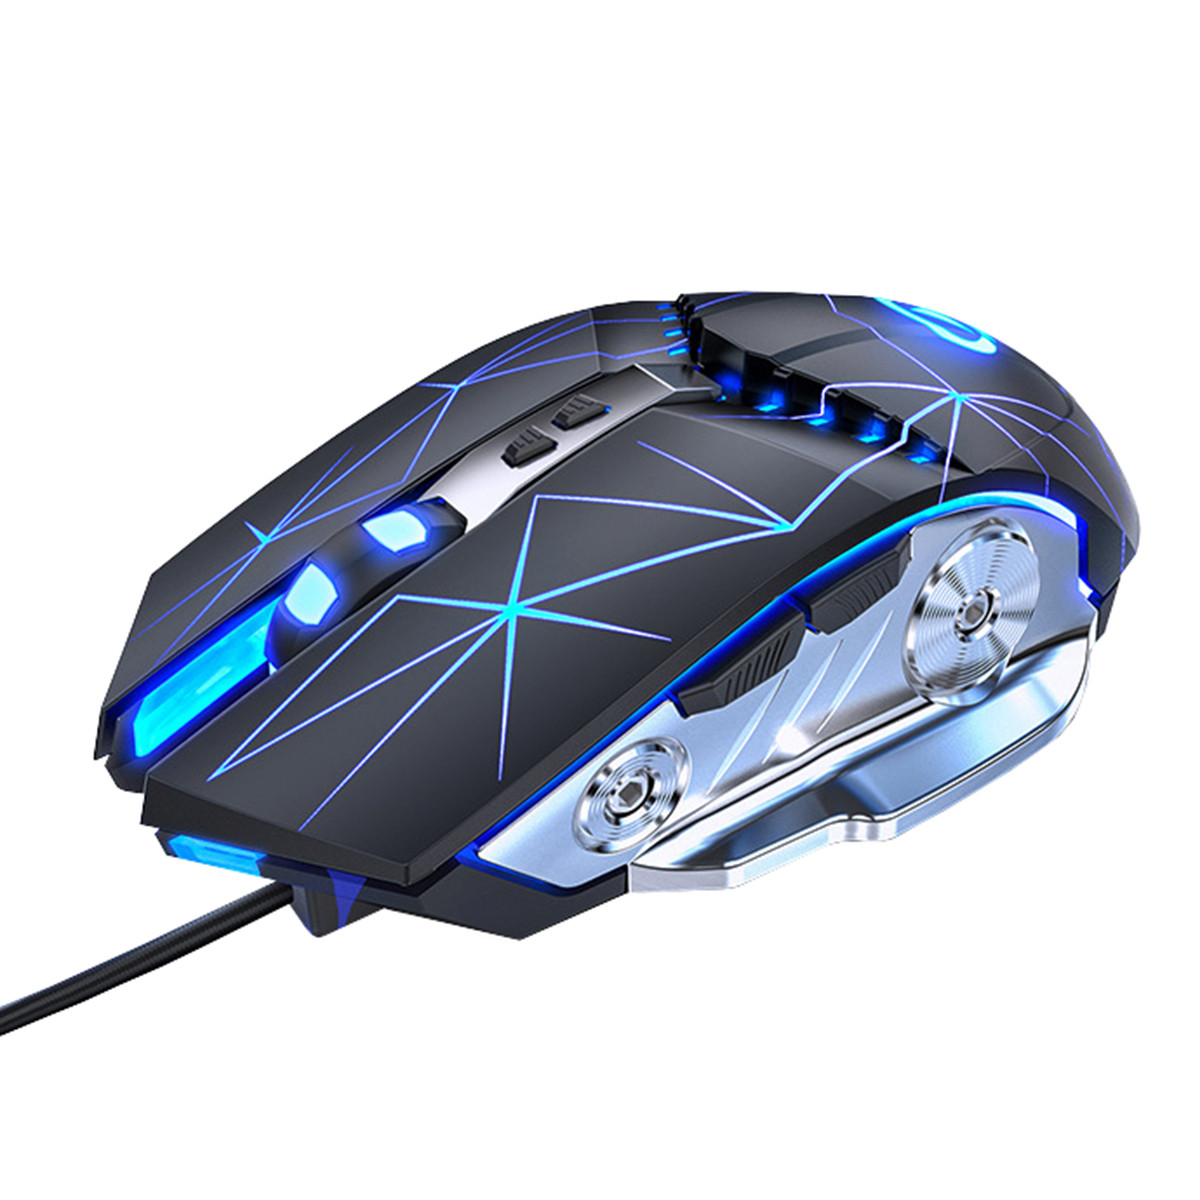 Мышь геймерская SKY (G3 Pro S) Star Black, 3200 DPI, RGB